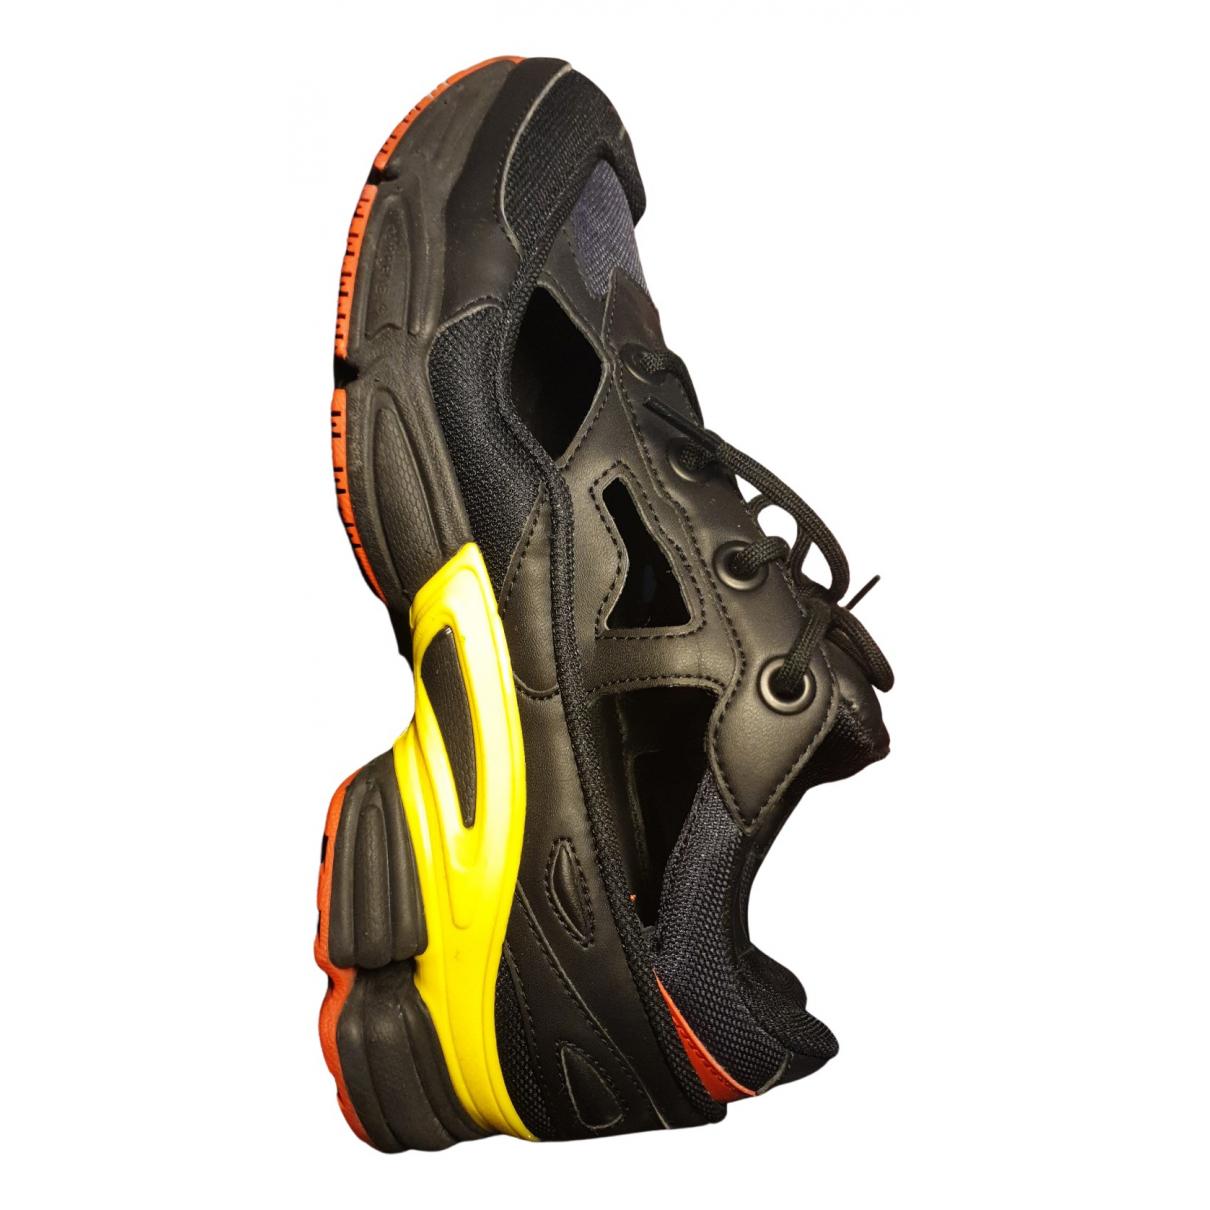 Adidas X Raf Simons - Baskets Replicant Owzeego pour homme en cuir - noir